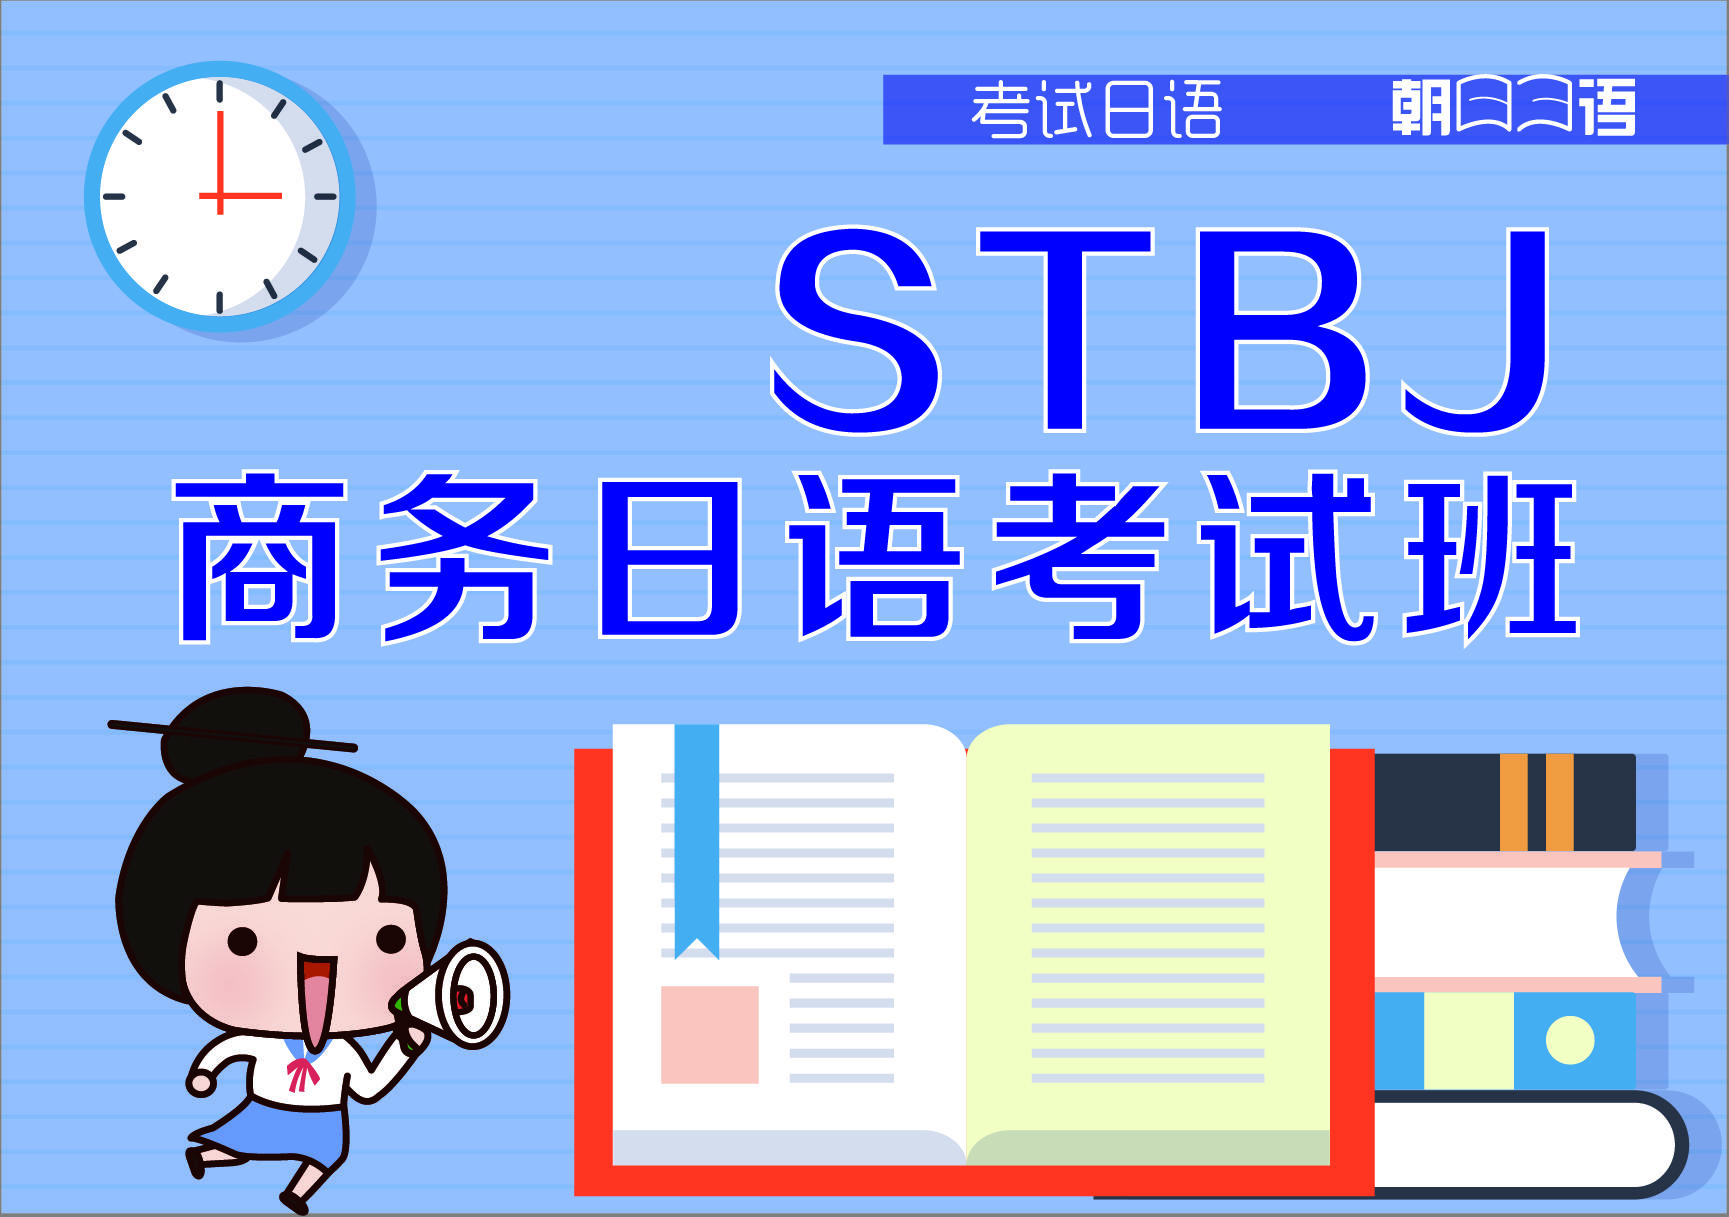 STBJ商务日语考试班